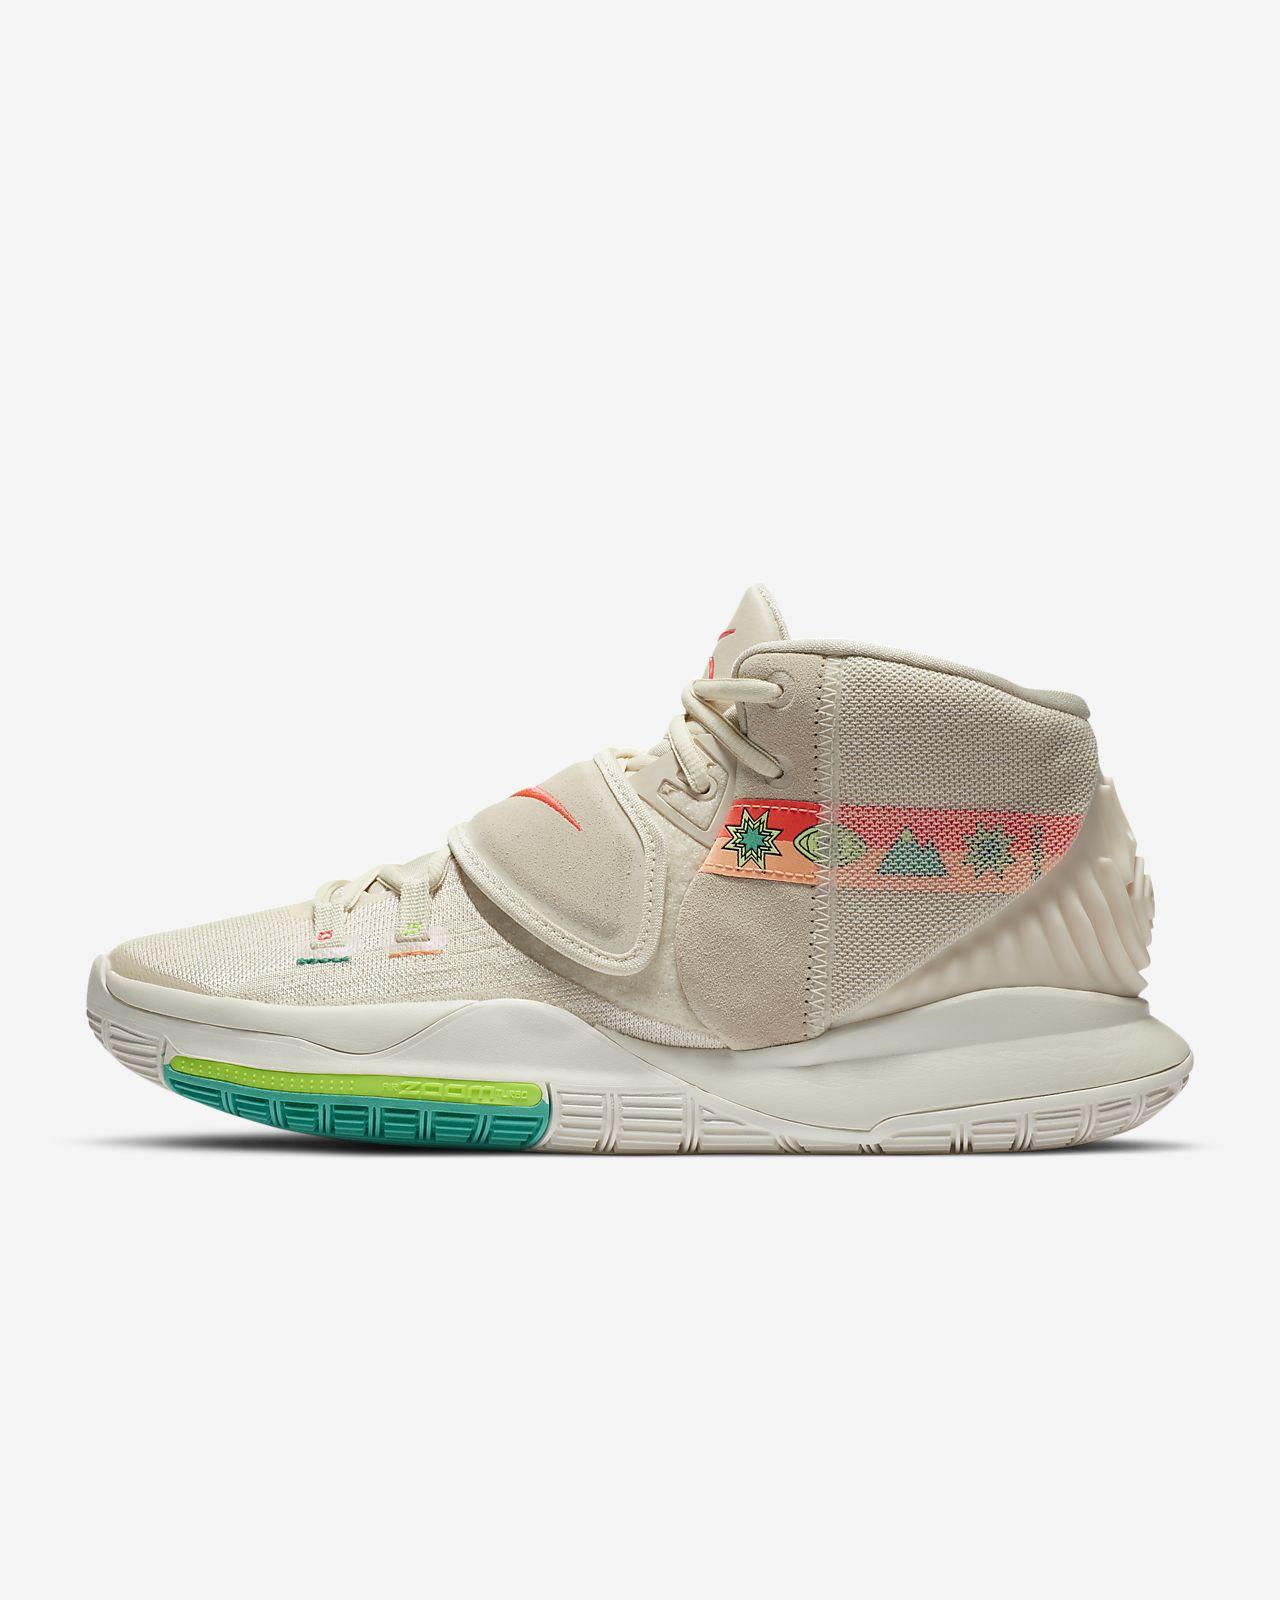 Kyrie 6 N7 Basketball Shoe